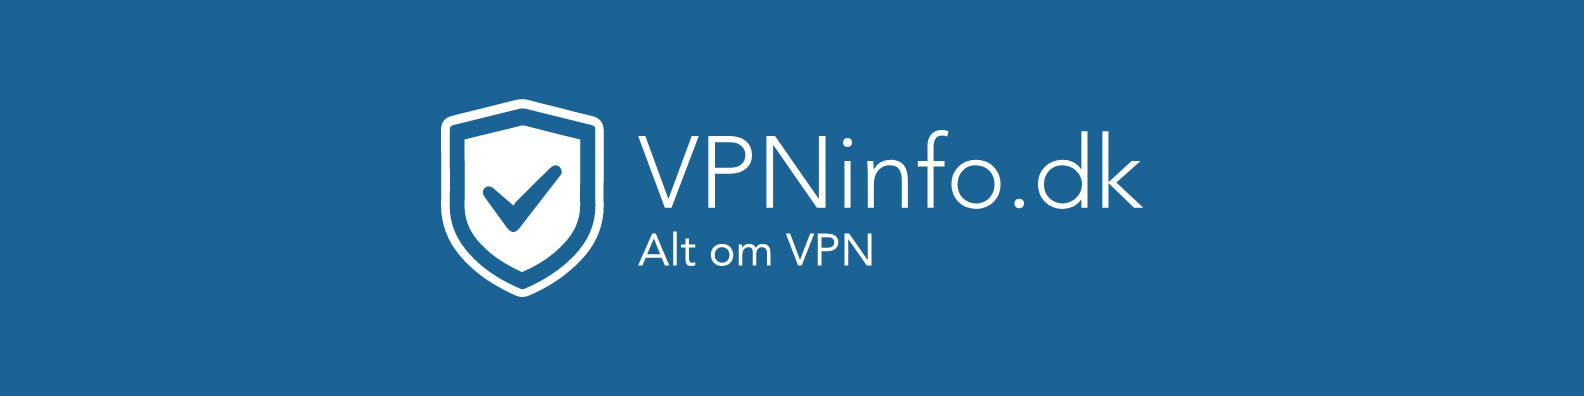 VPNinfo.dk